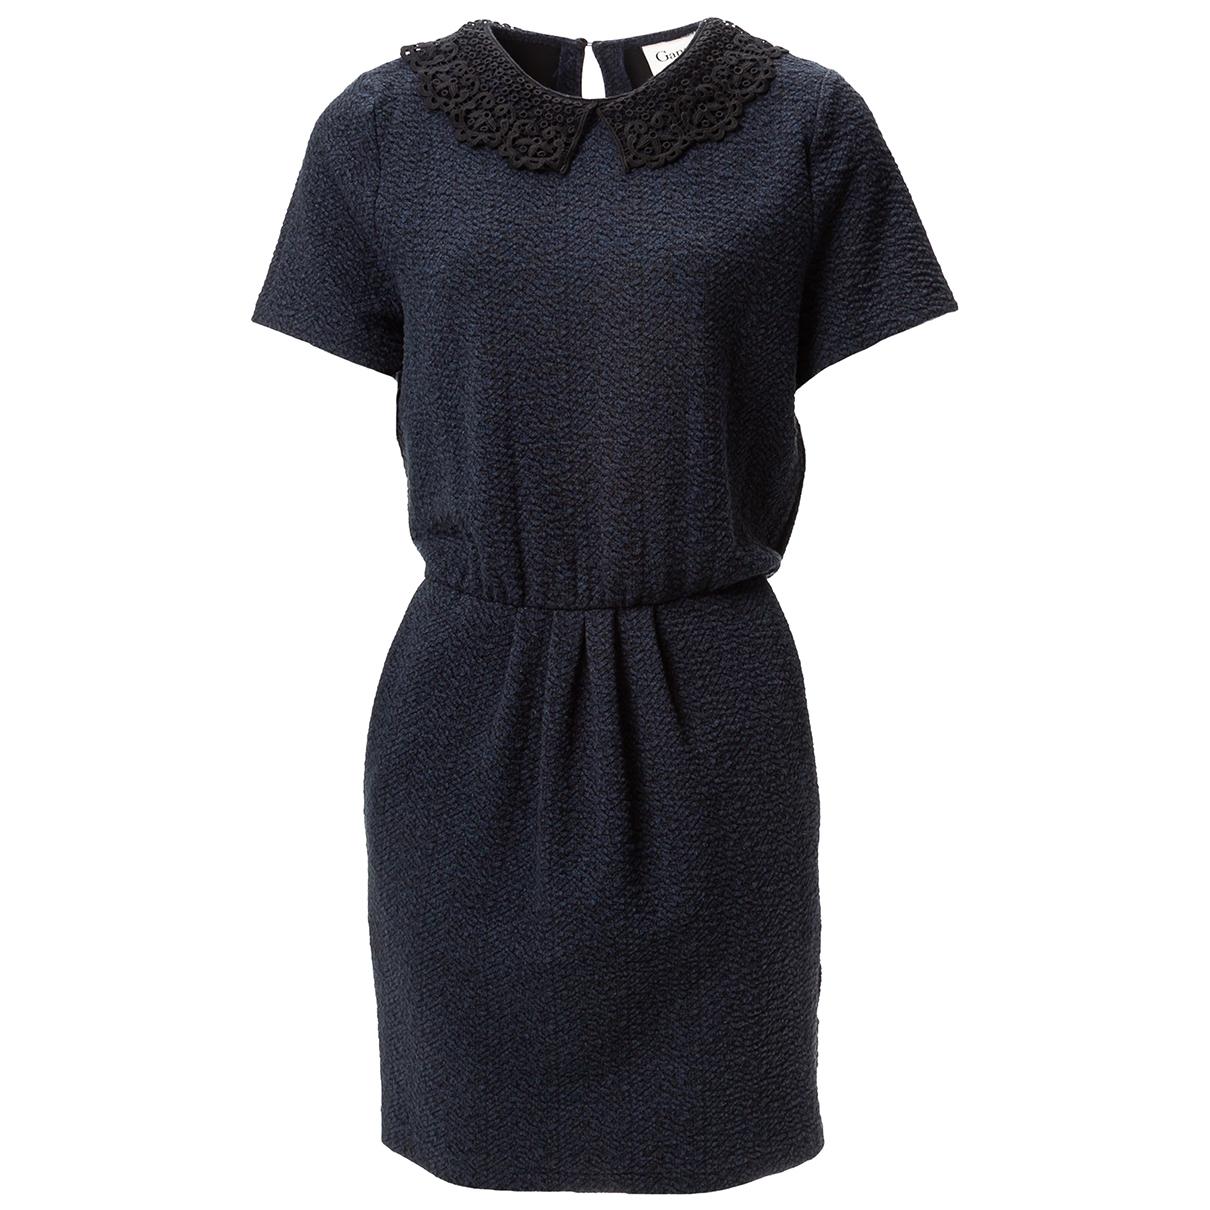 Ganni \N Navy dress for Women L International